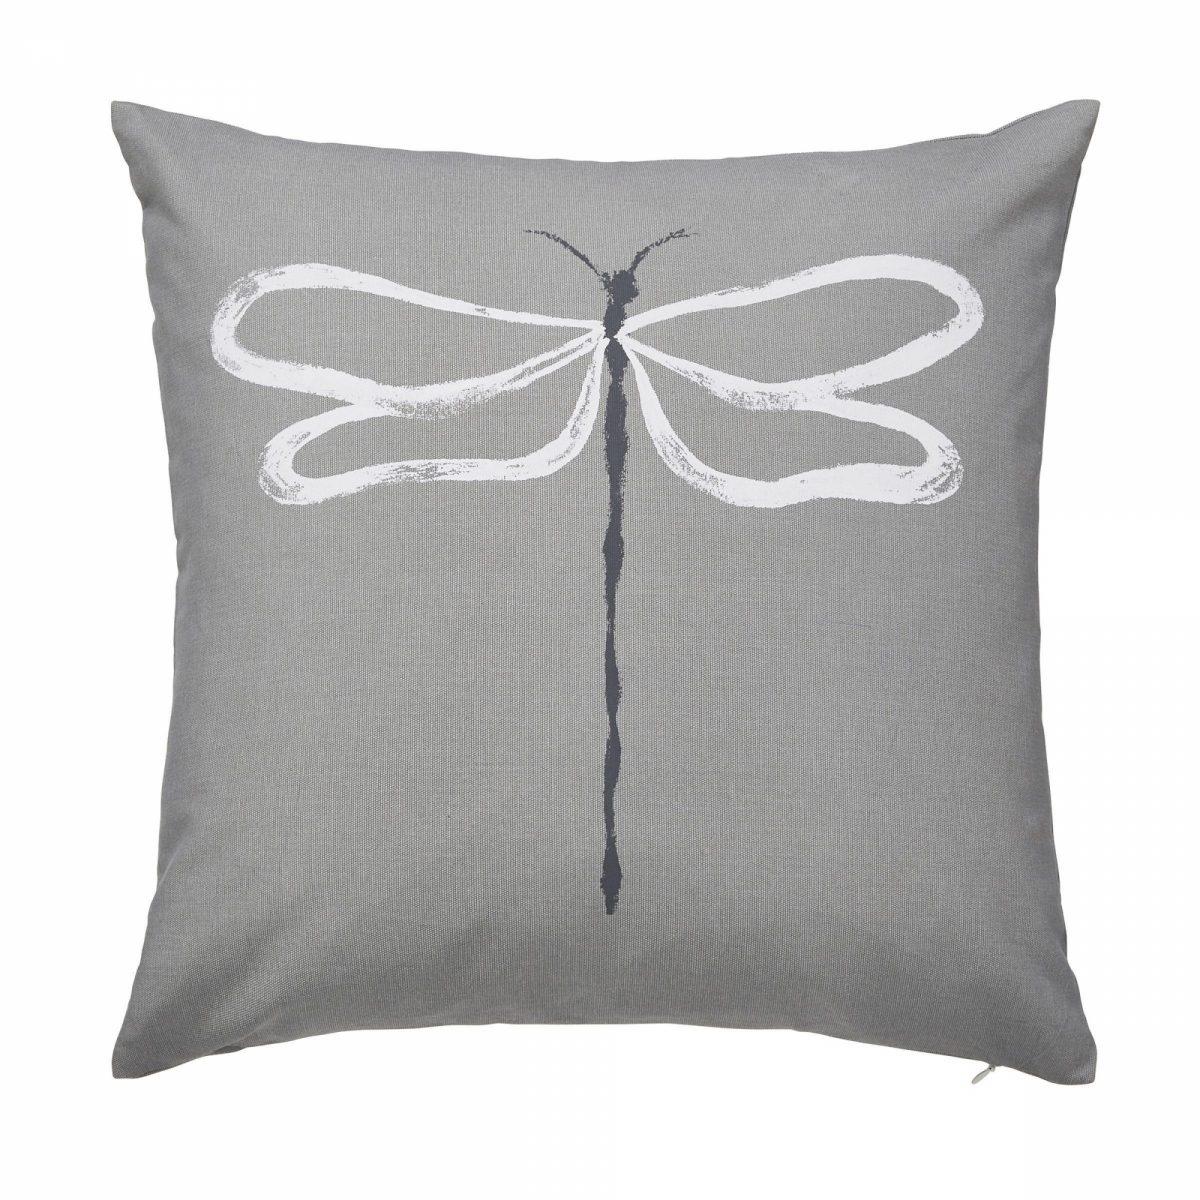 Scion living usuko rose cushion co